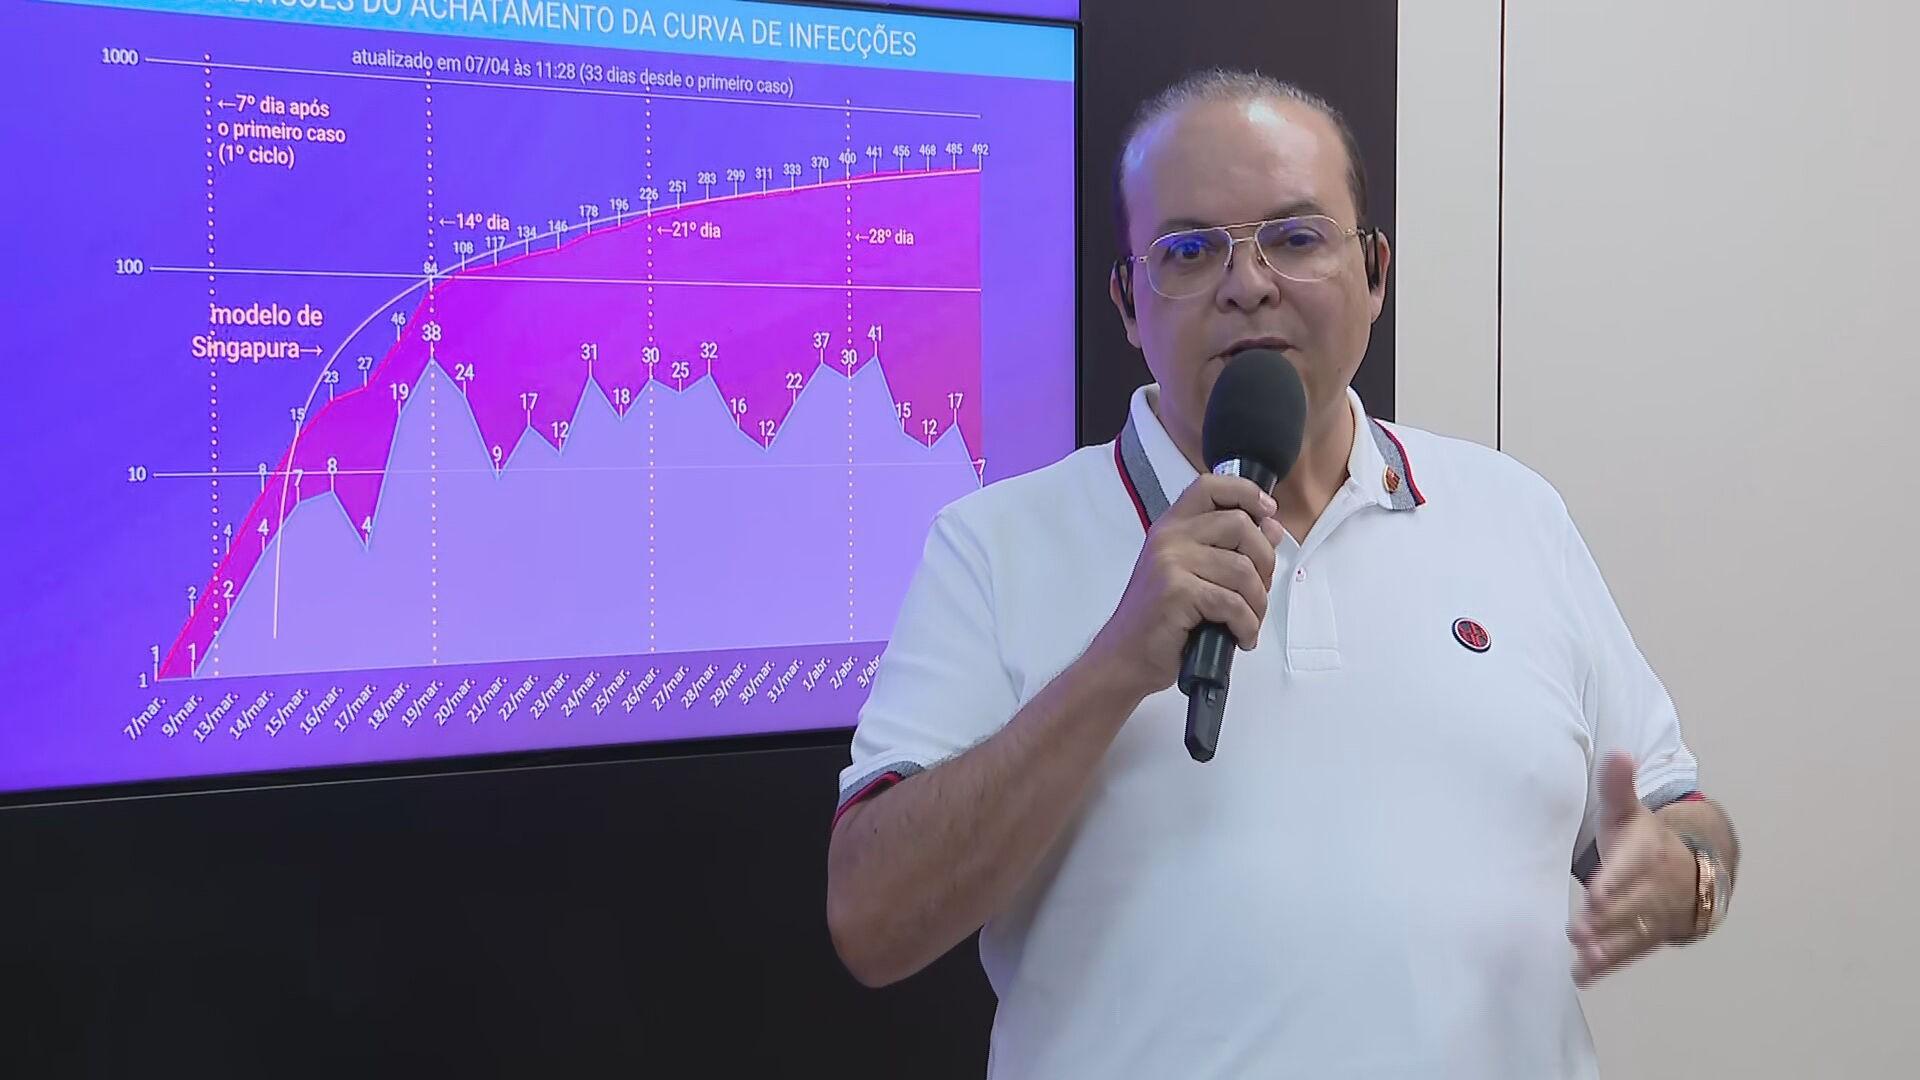 Ibaneis anuncia que vai liberar abertura de bancos no DF